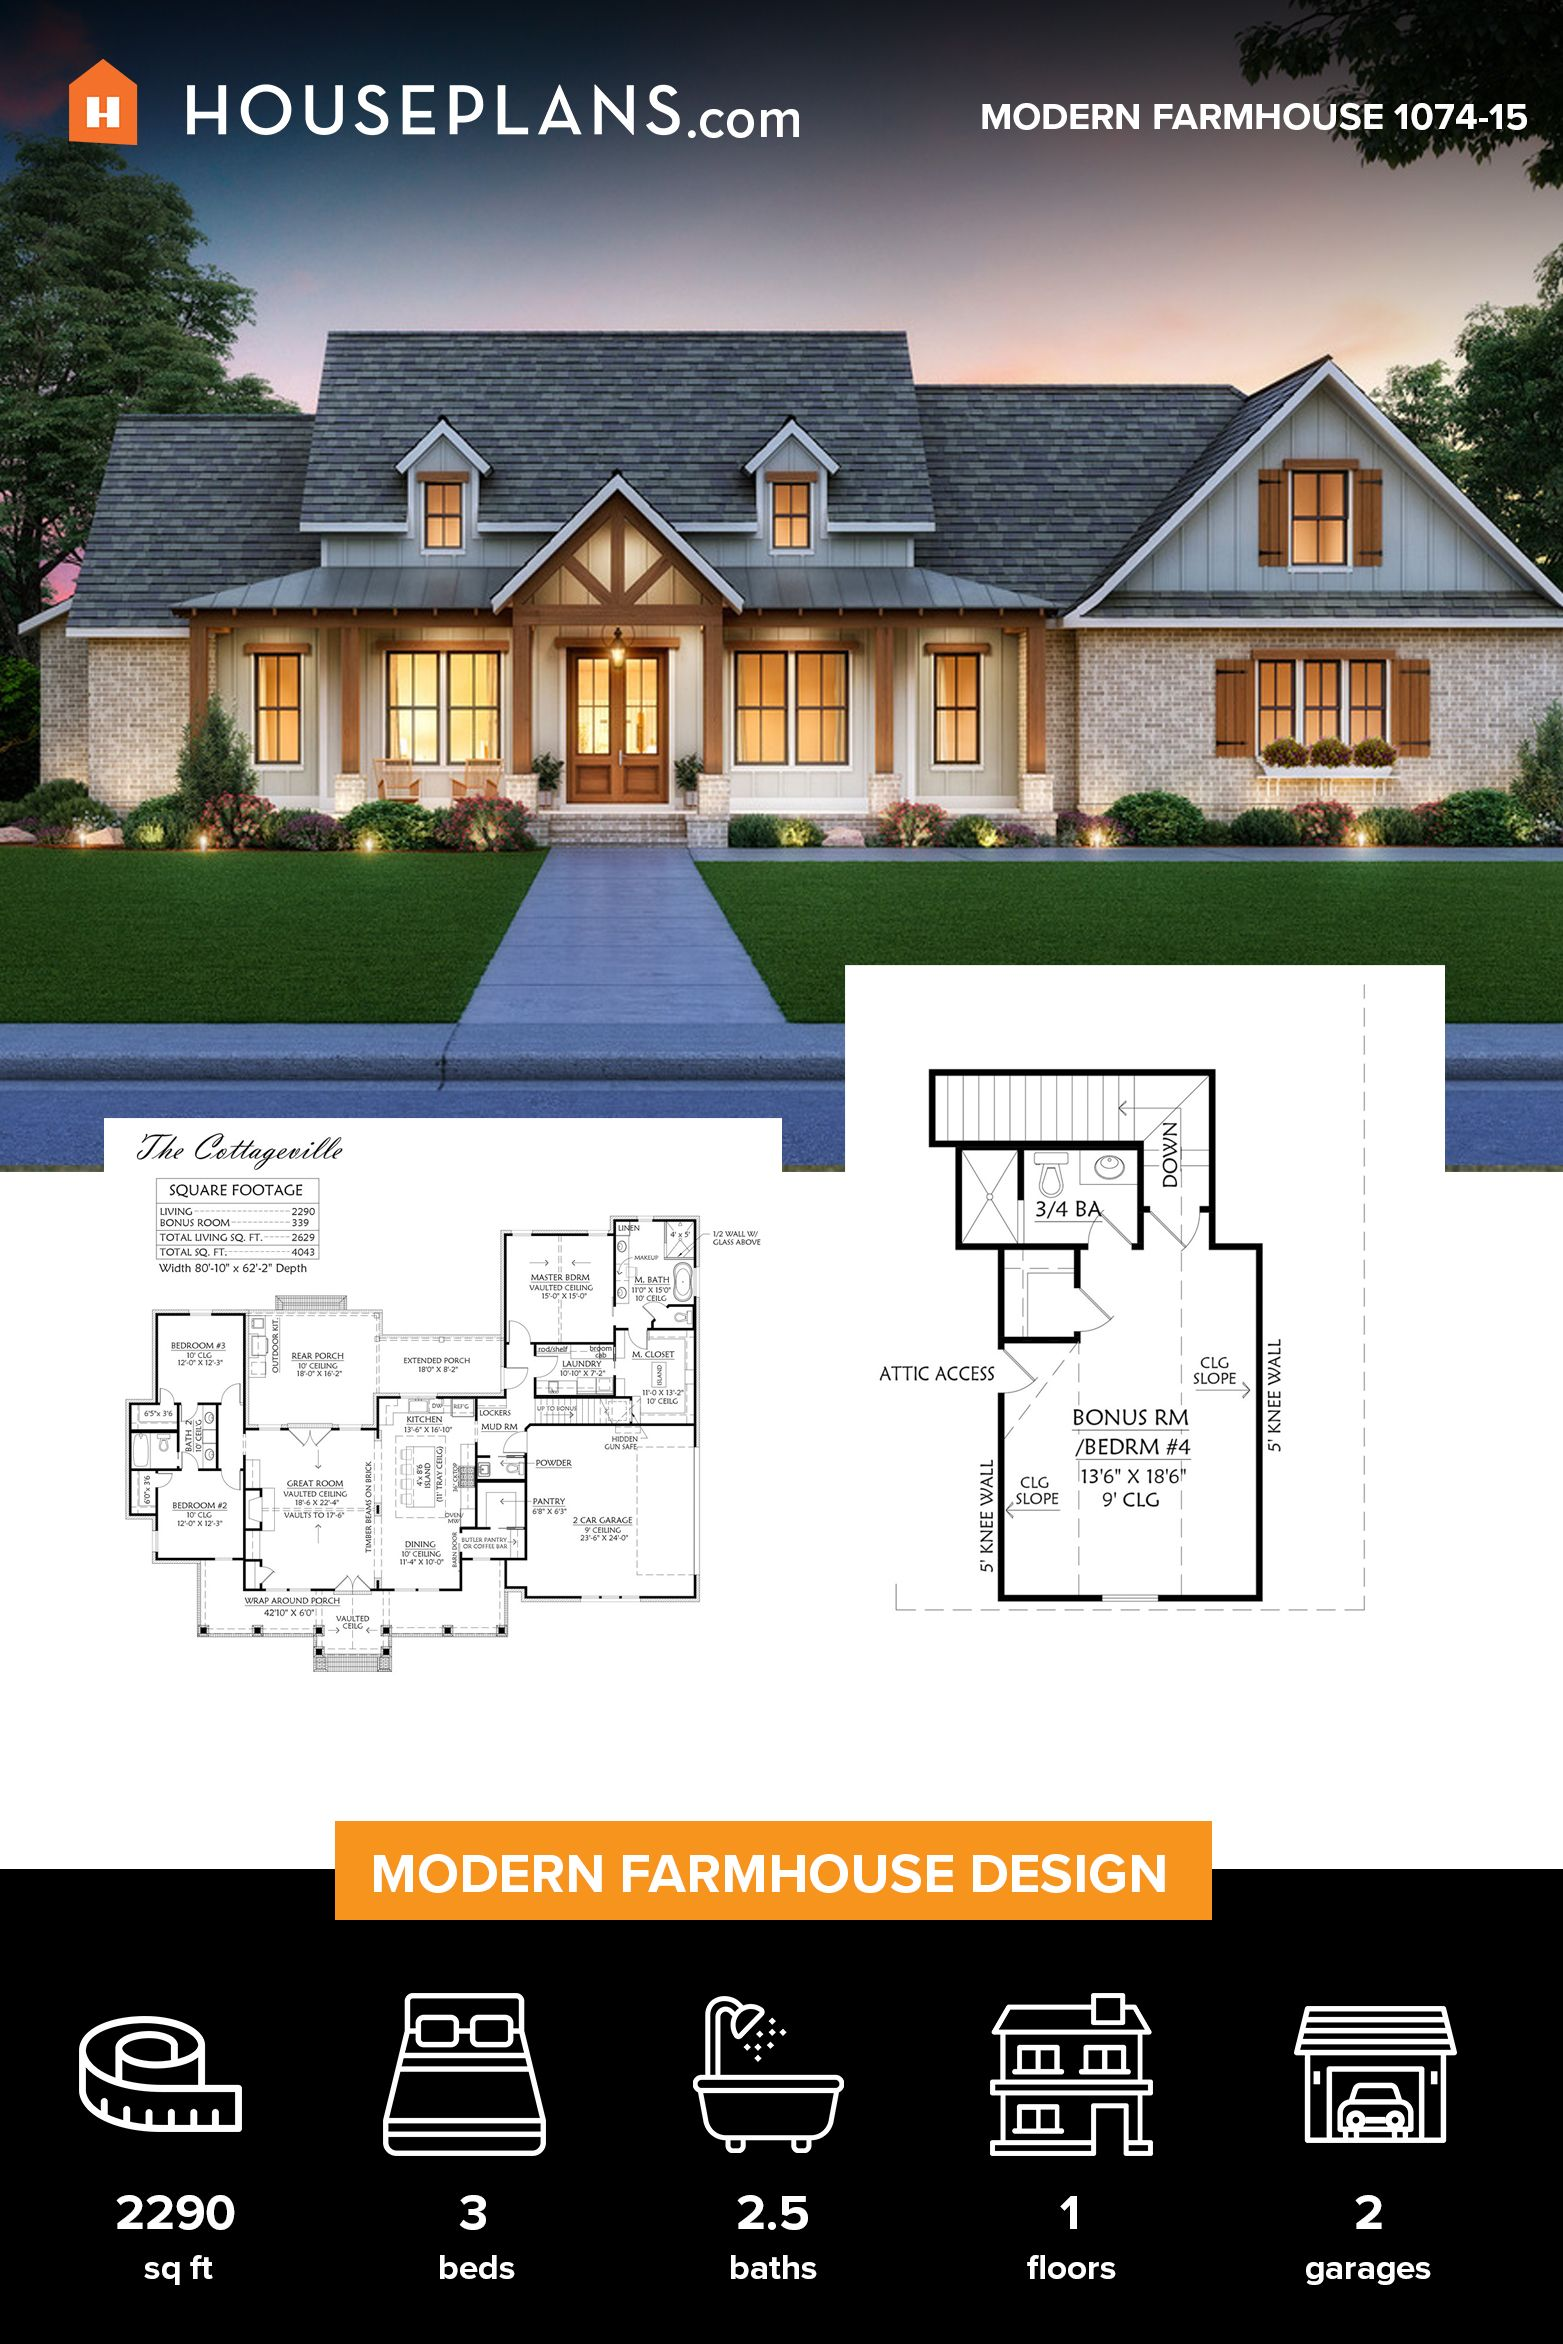 Modern Farmhouse Exterior Modern Farmhouse Plans Family House Plans Farmhouse Floor Plans